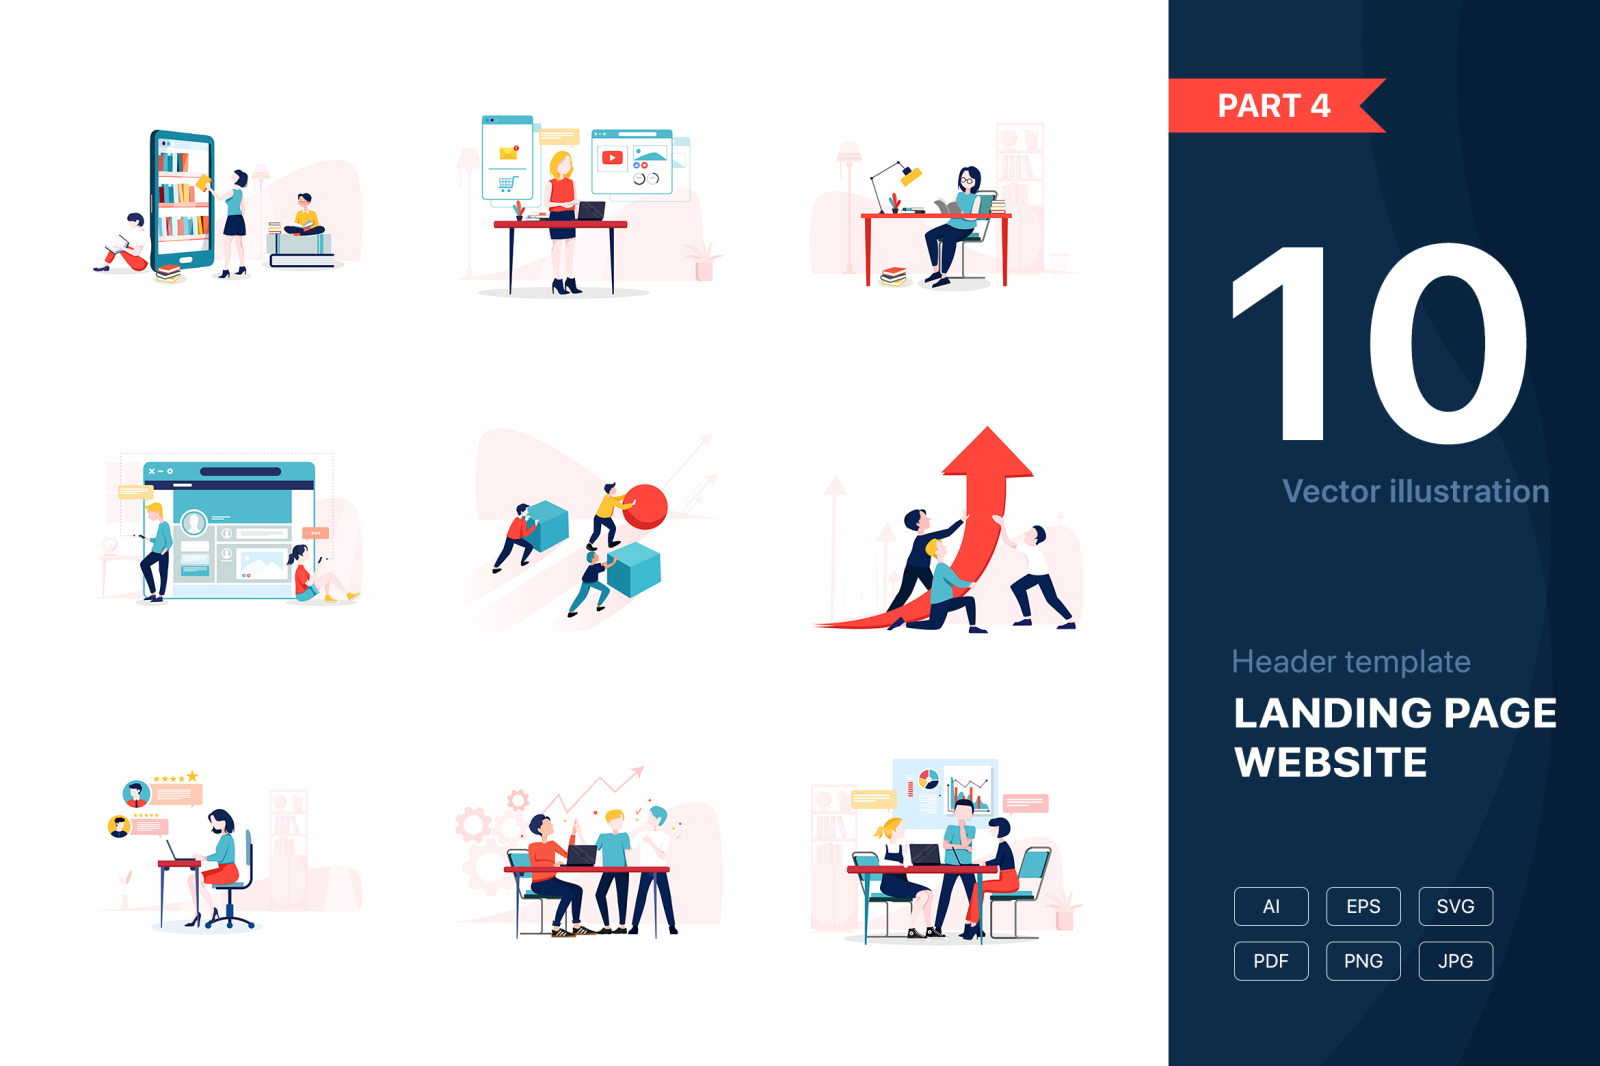 [Part 4] Website Illustrations Set